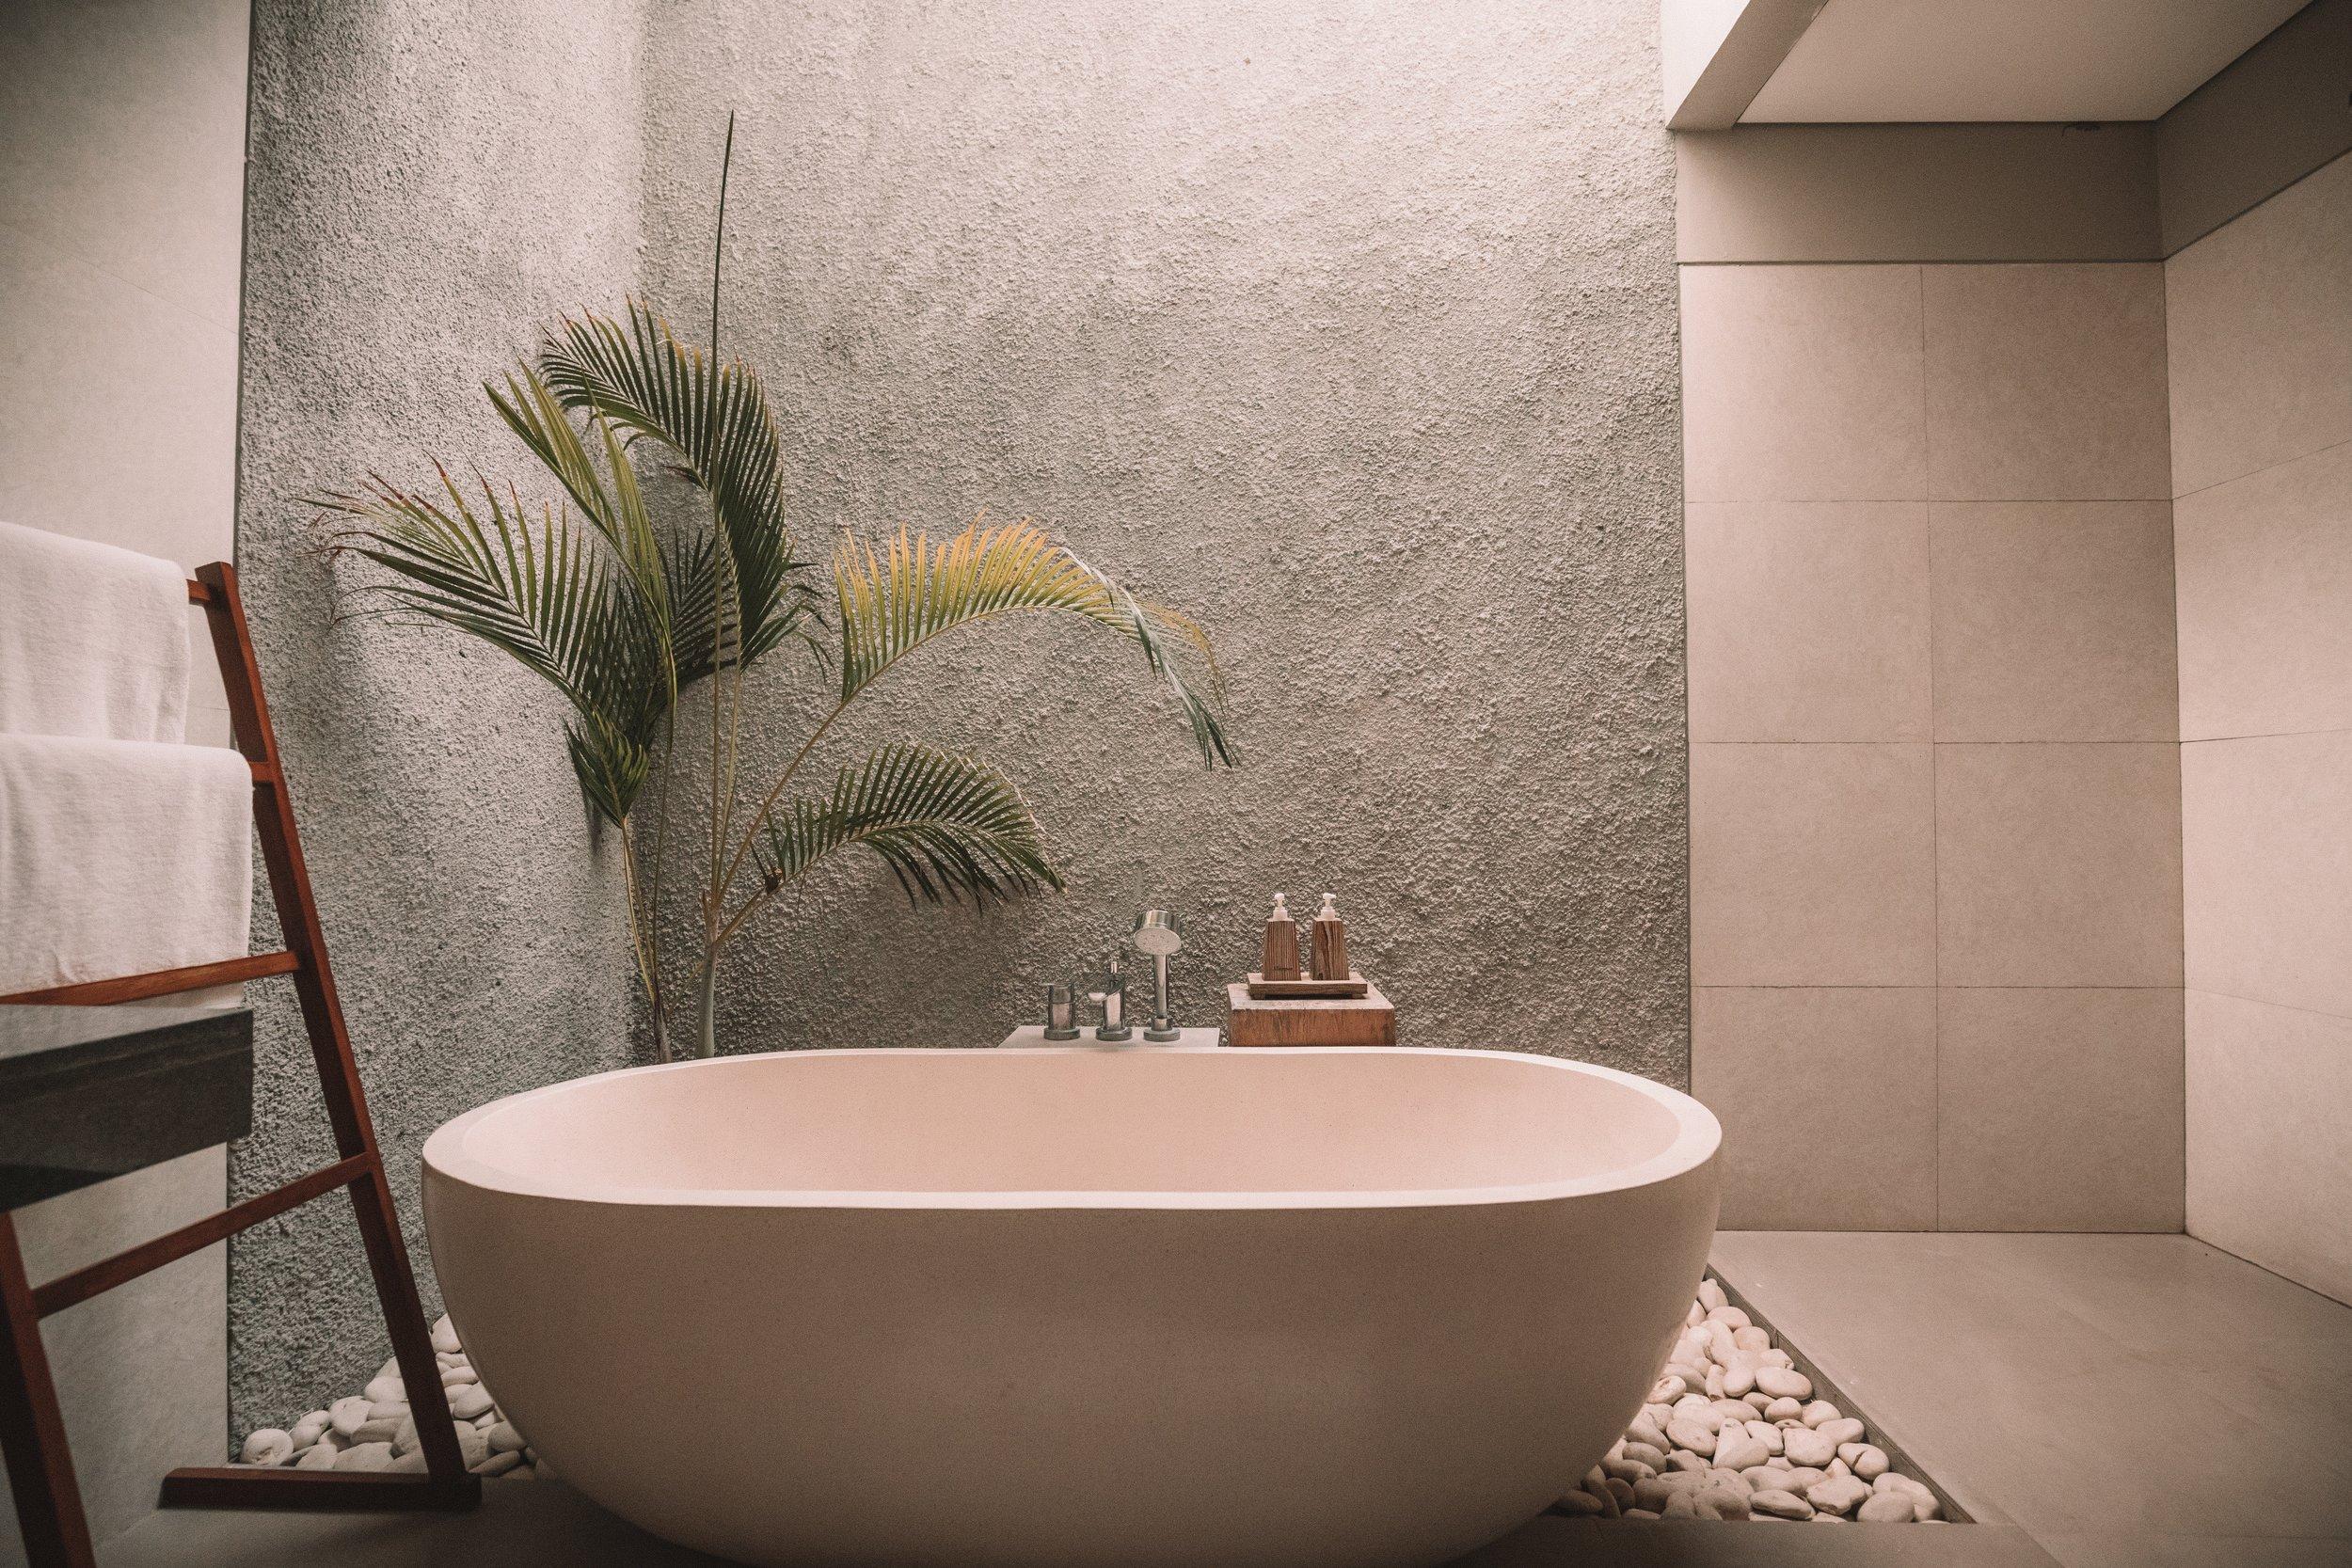 Bathroom refurbishment company London